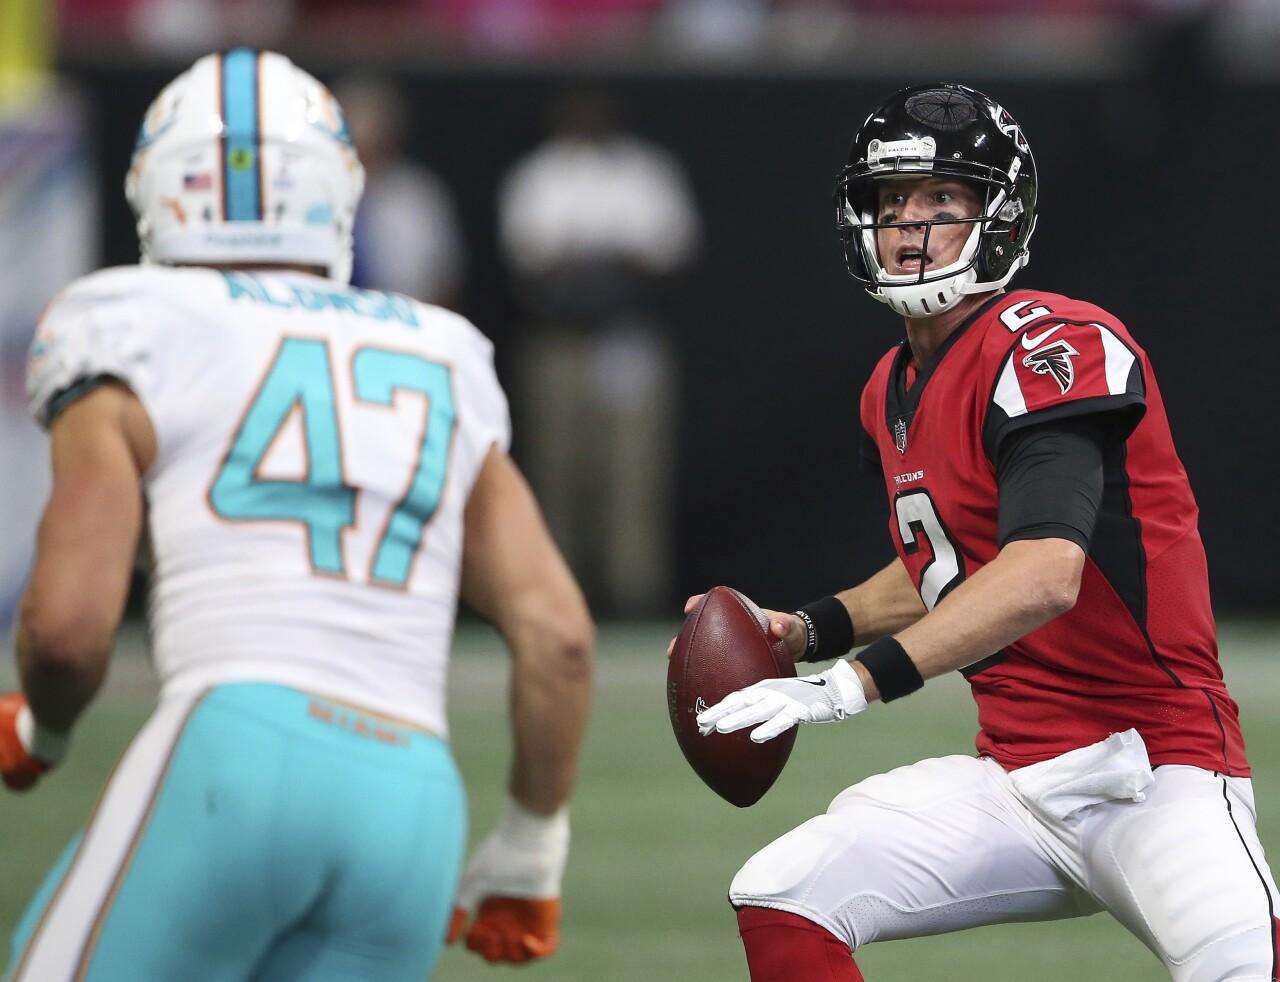 Atlanta Falcons QB Matt Ryan looks to throw vs. Miami Dolphins in 2017